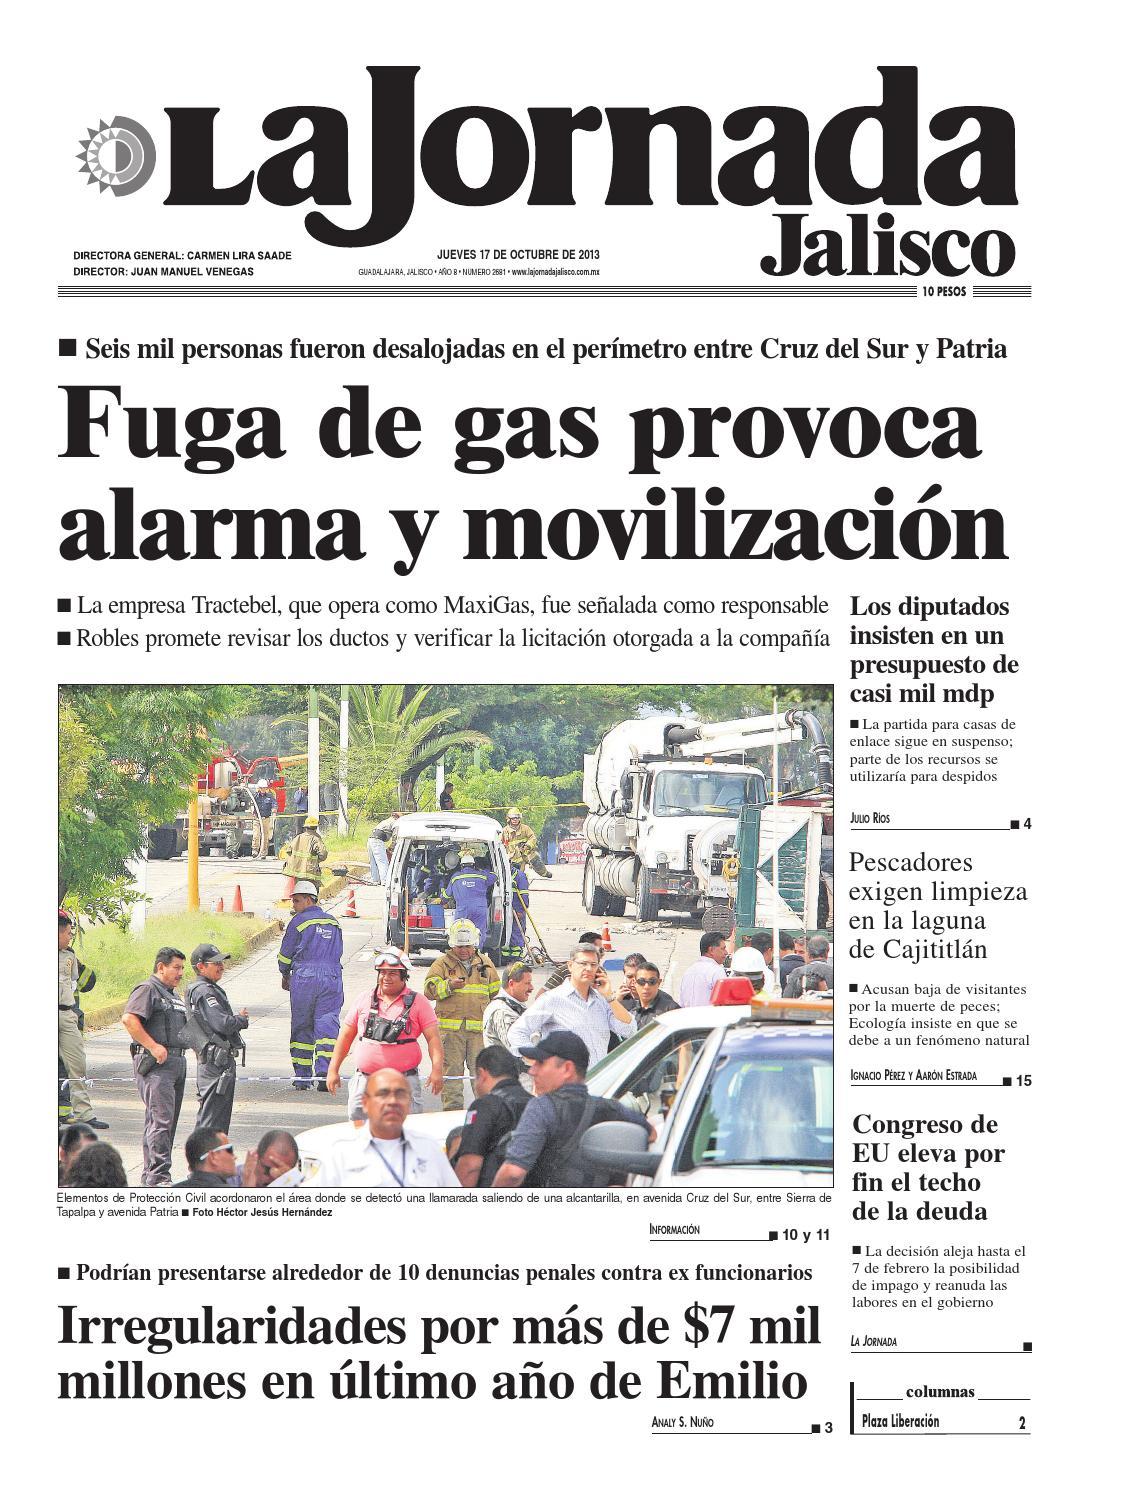 La Jornada Jalisco 17 octubre 2013 by La Jornada Jalisco - issuu